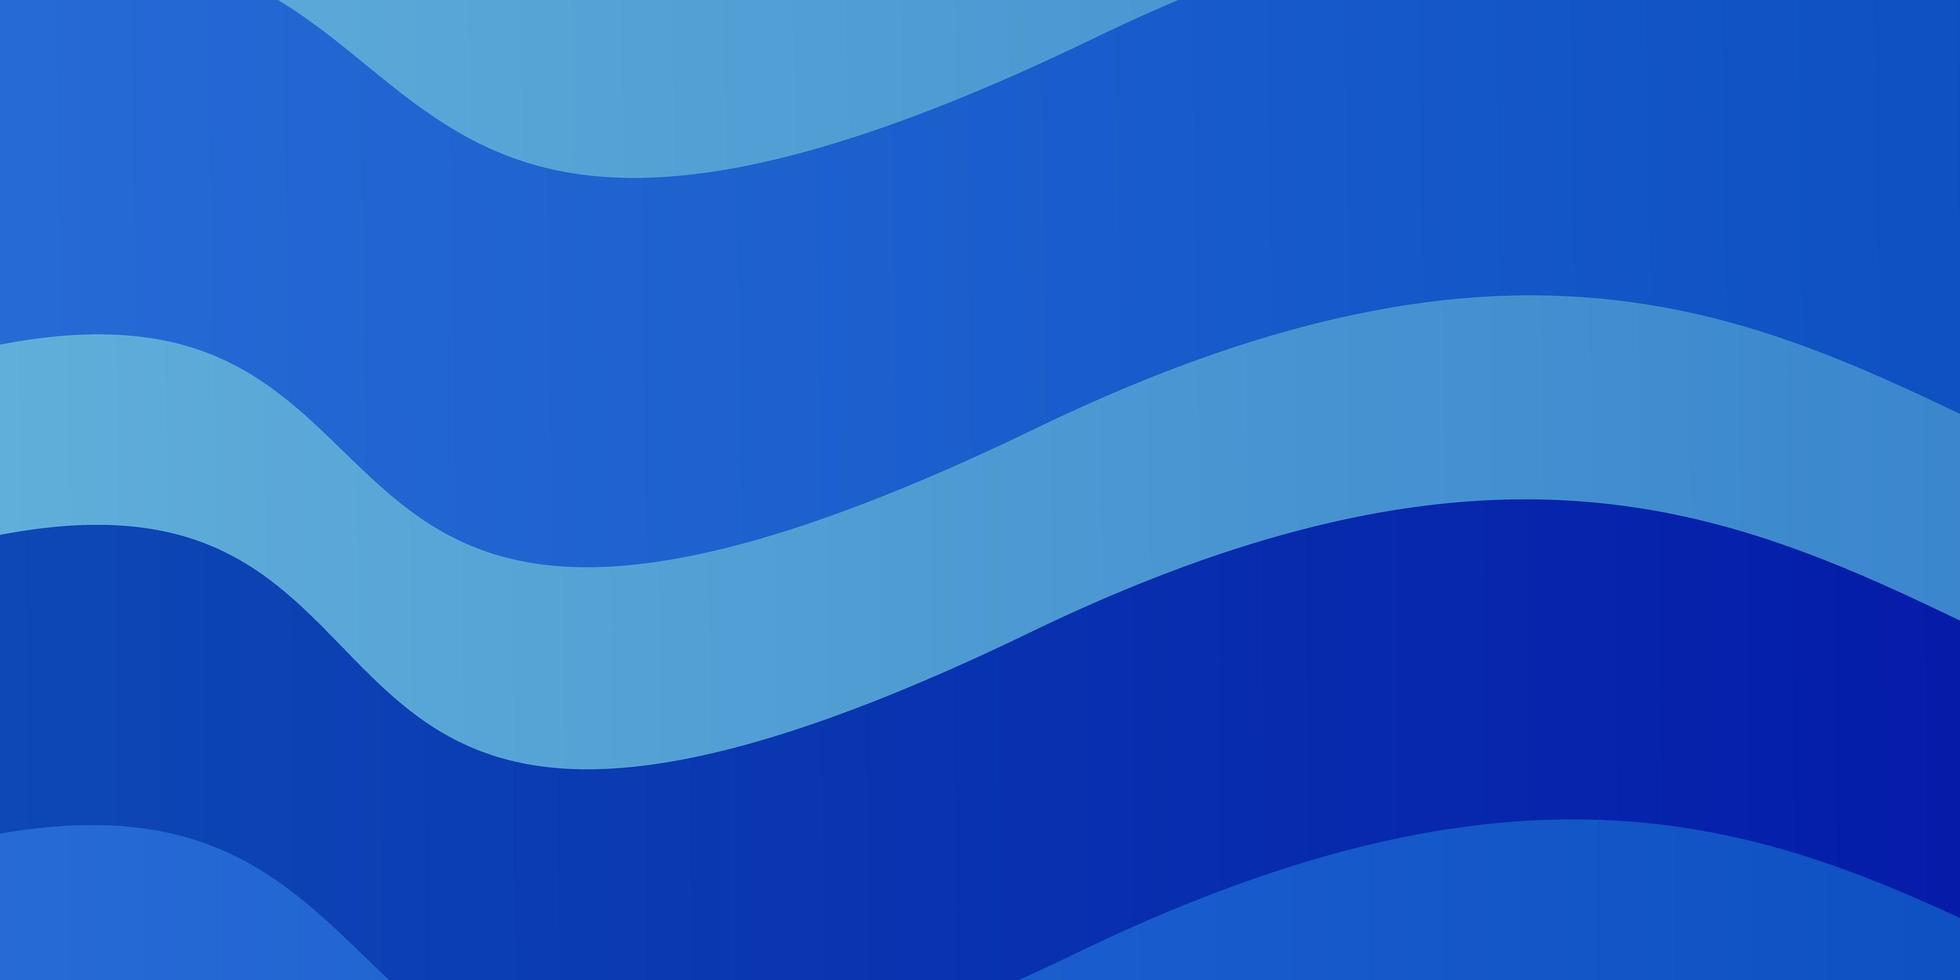 plantilla de vector azul claro con líneas torcidas.